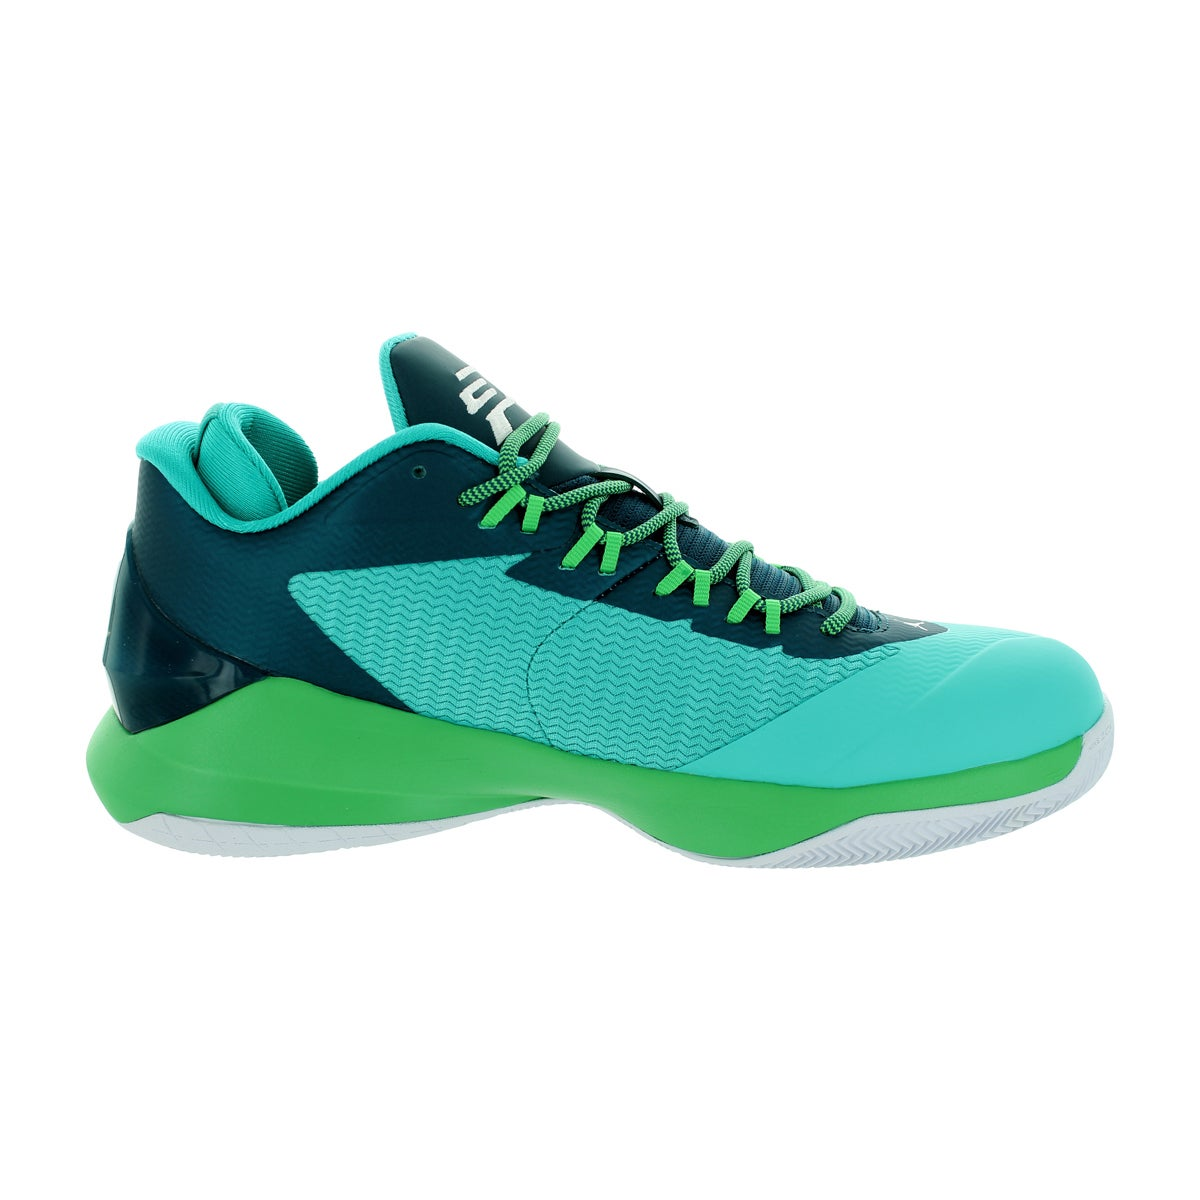 05a6819bef15fd Shop Nike Jordan Men s Jordan Cp3.Viii Retro White Teal Black Basketball  Shoe - Free Shipping Today - Overstock - 12318562